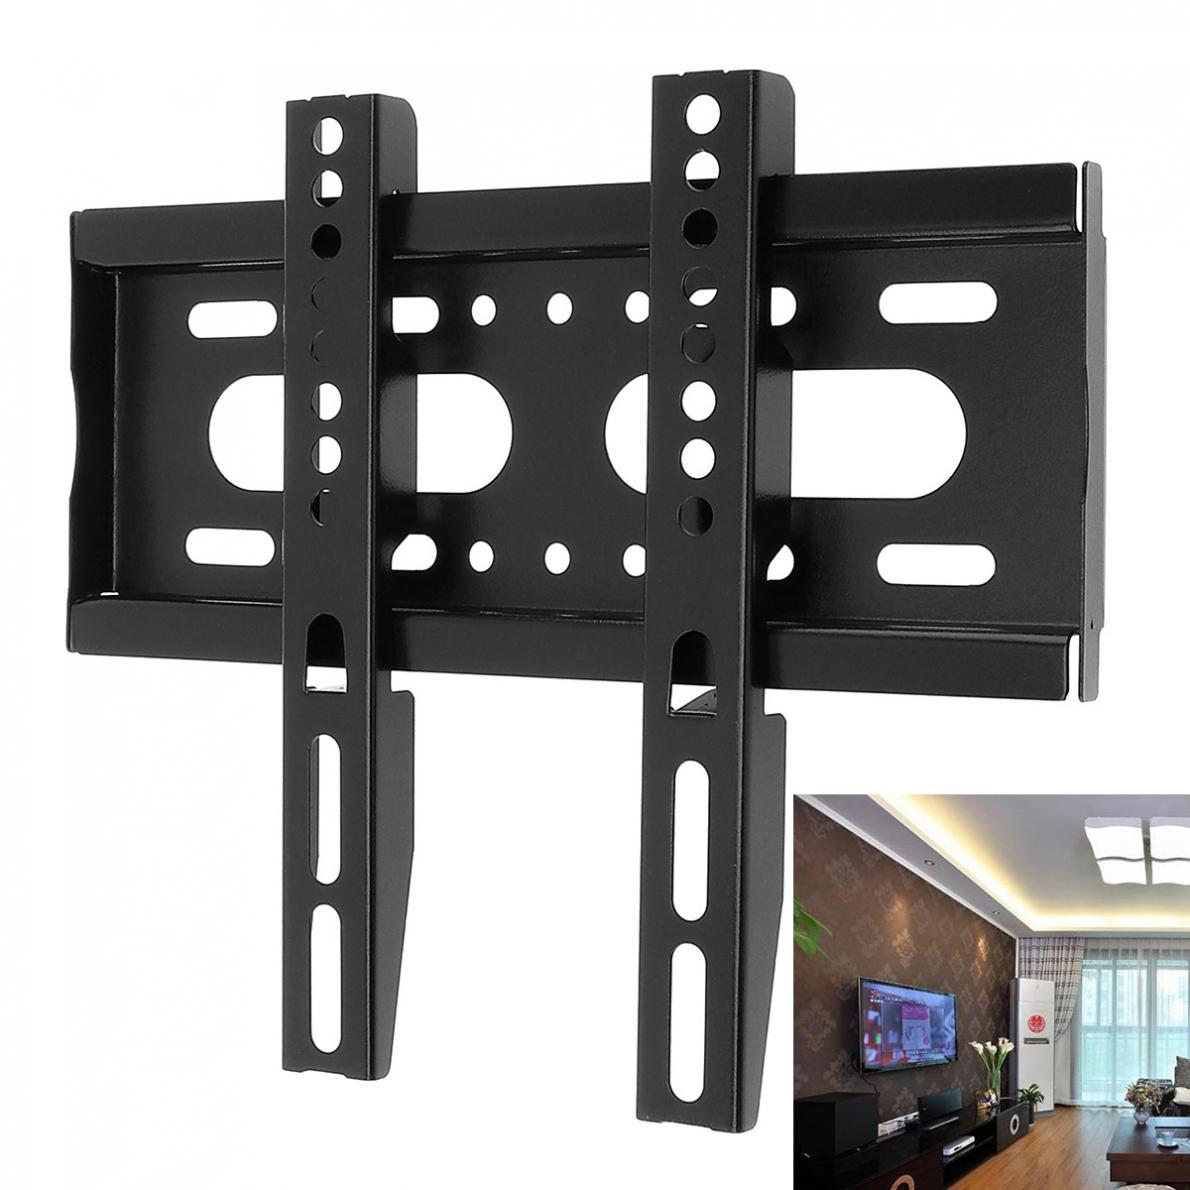 Universal 25KG TV Wall Mount Bracket Fixed Flat Panel TV Frame for 14-42 Inch LCD LED Monitor Flat Panel Bracket